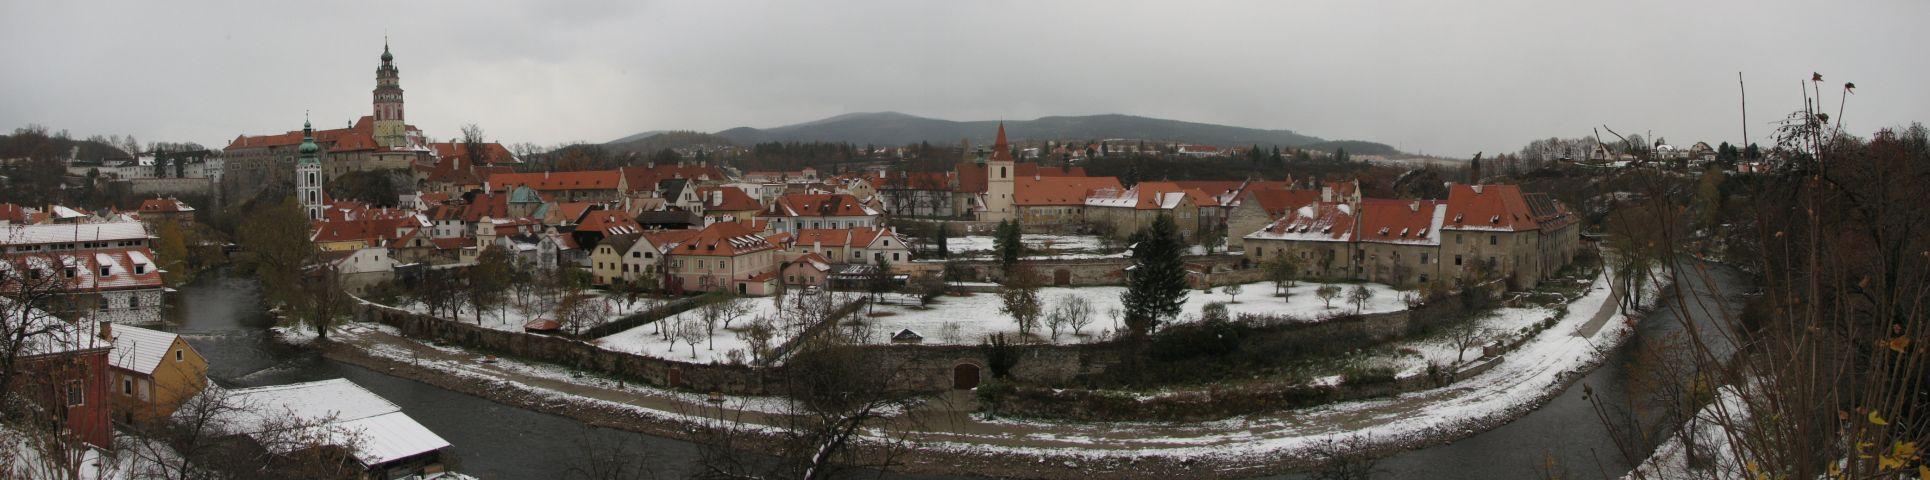 http://www.talusha1.narod.ru/travel/czechia/cesky_krumlov/pics/pan6.jpg